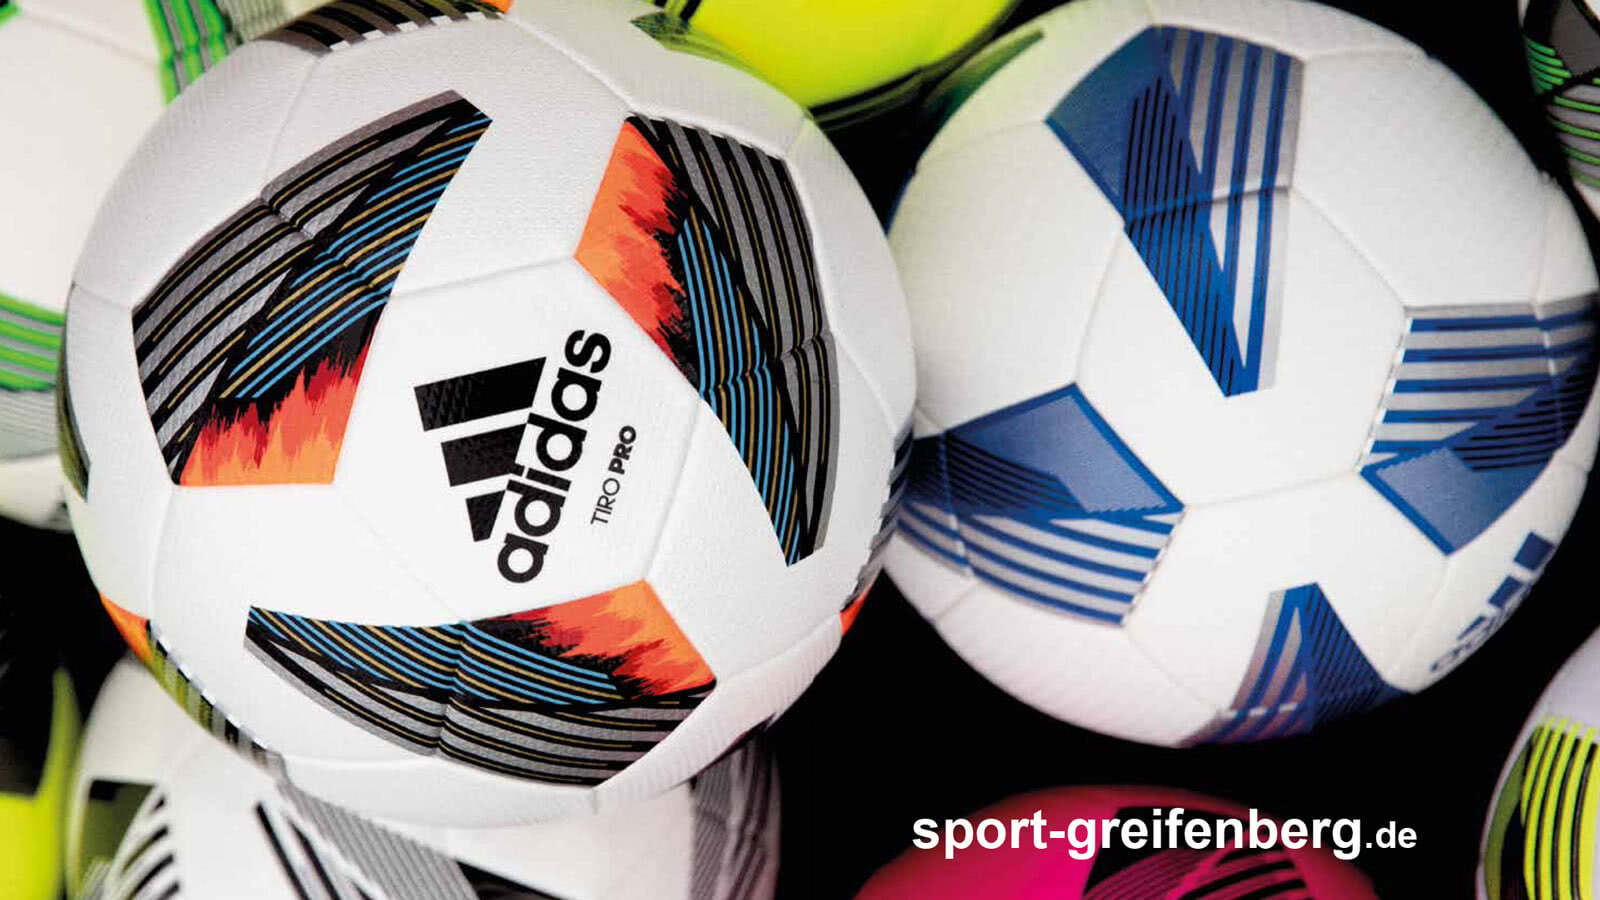 Die adidas Fußbälle für 2020/2021 im Teamsport Katalog